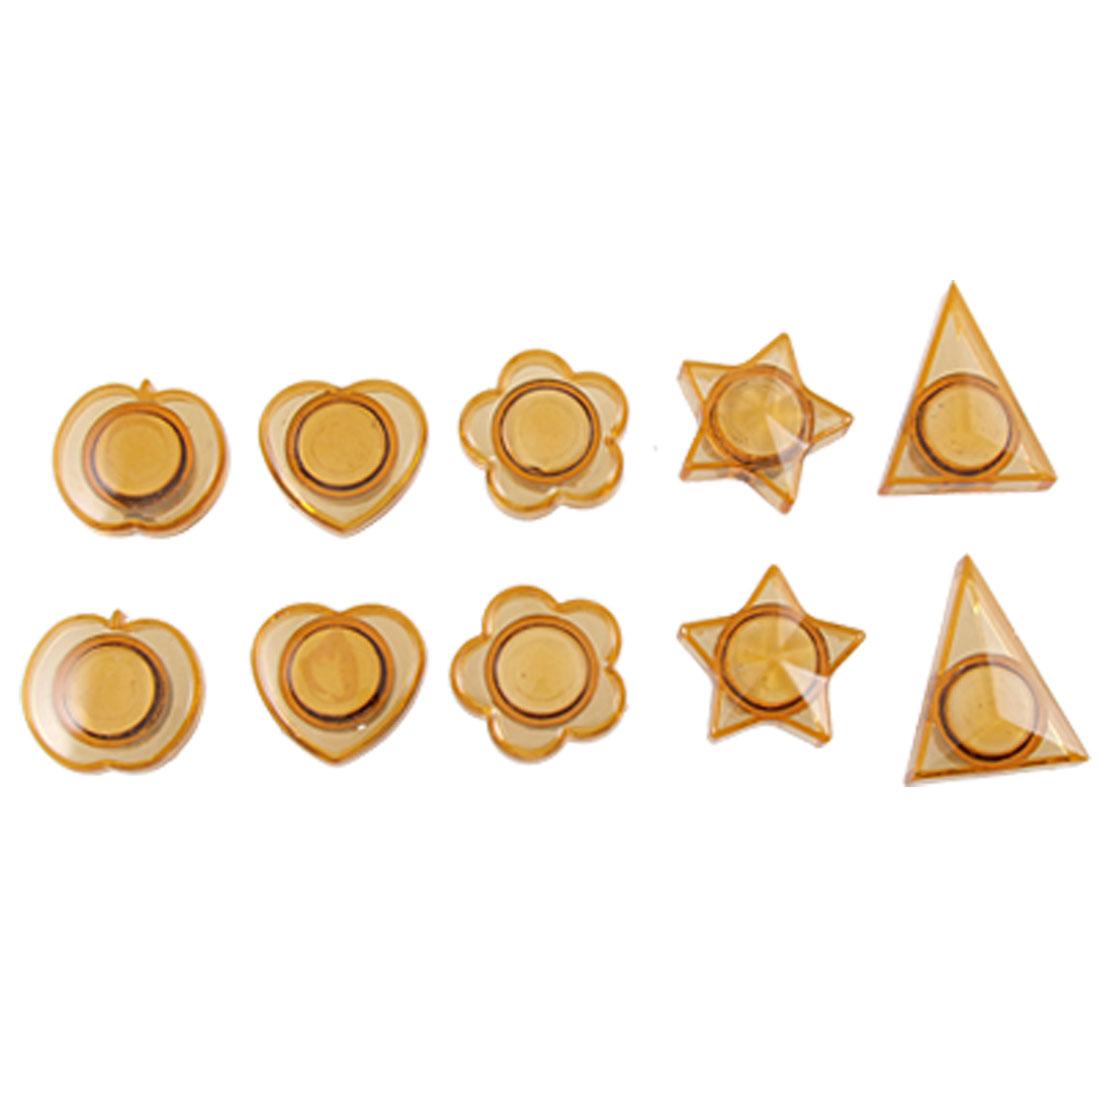 Refrigerator 10 Pcs Triangle Apple Flower Star Heart Magnet Sticker